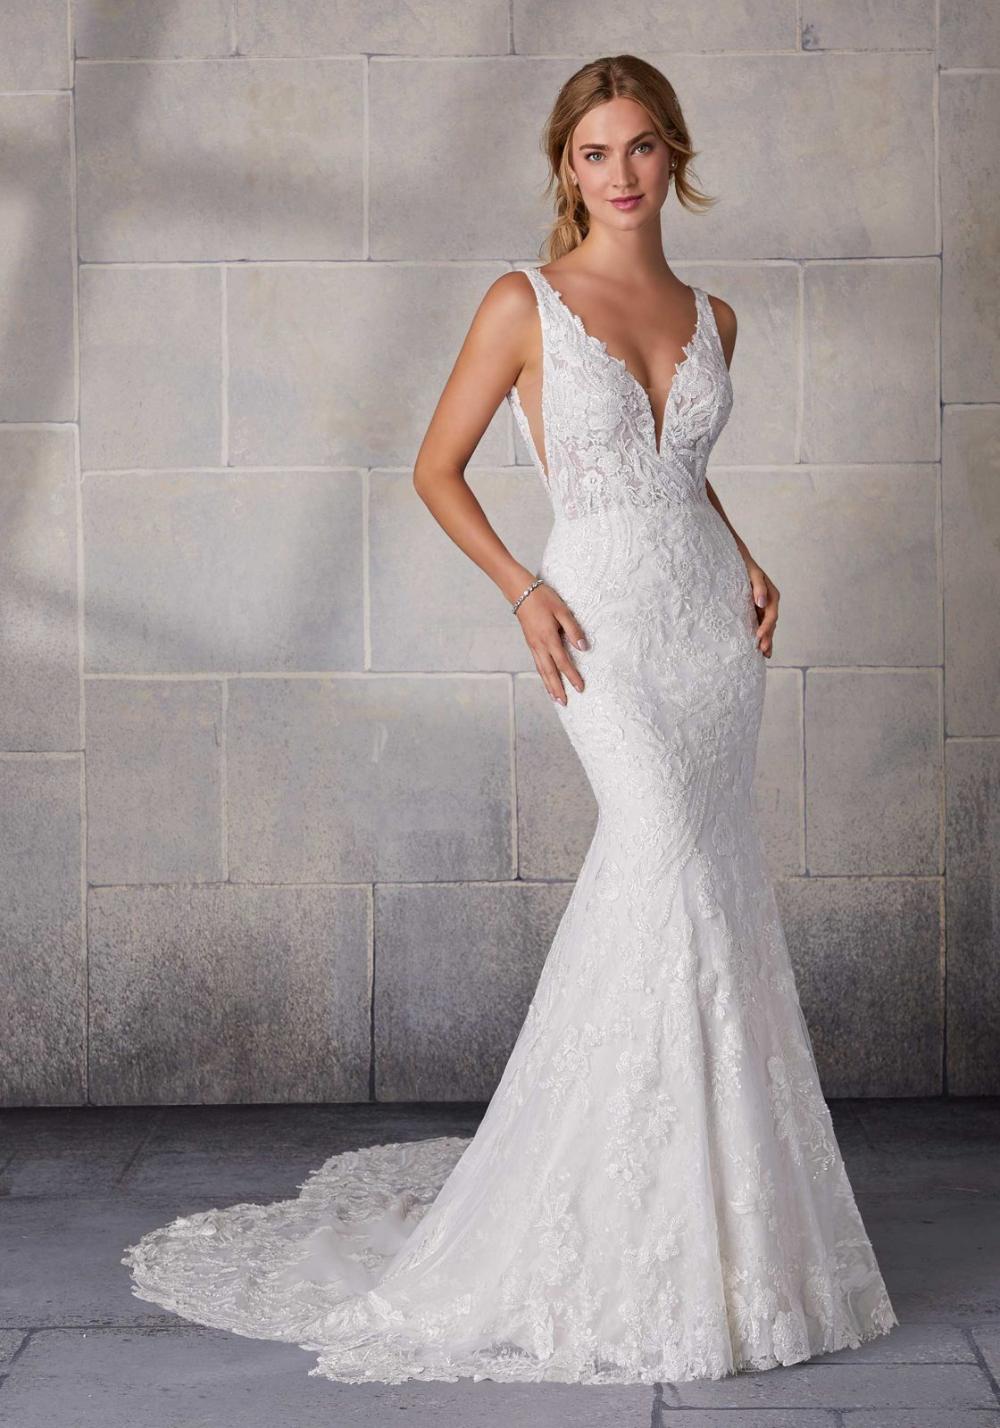 Stefani Wedding Dress Morilee Fit And Flare Wedding Dress